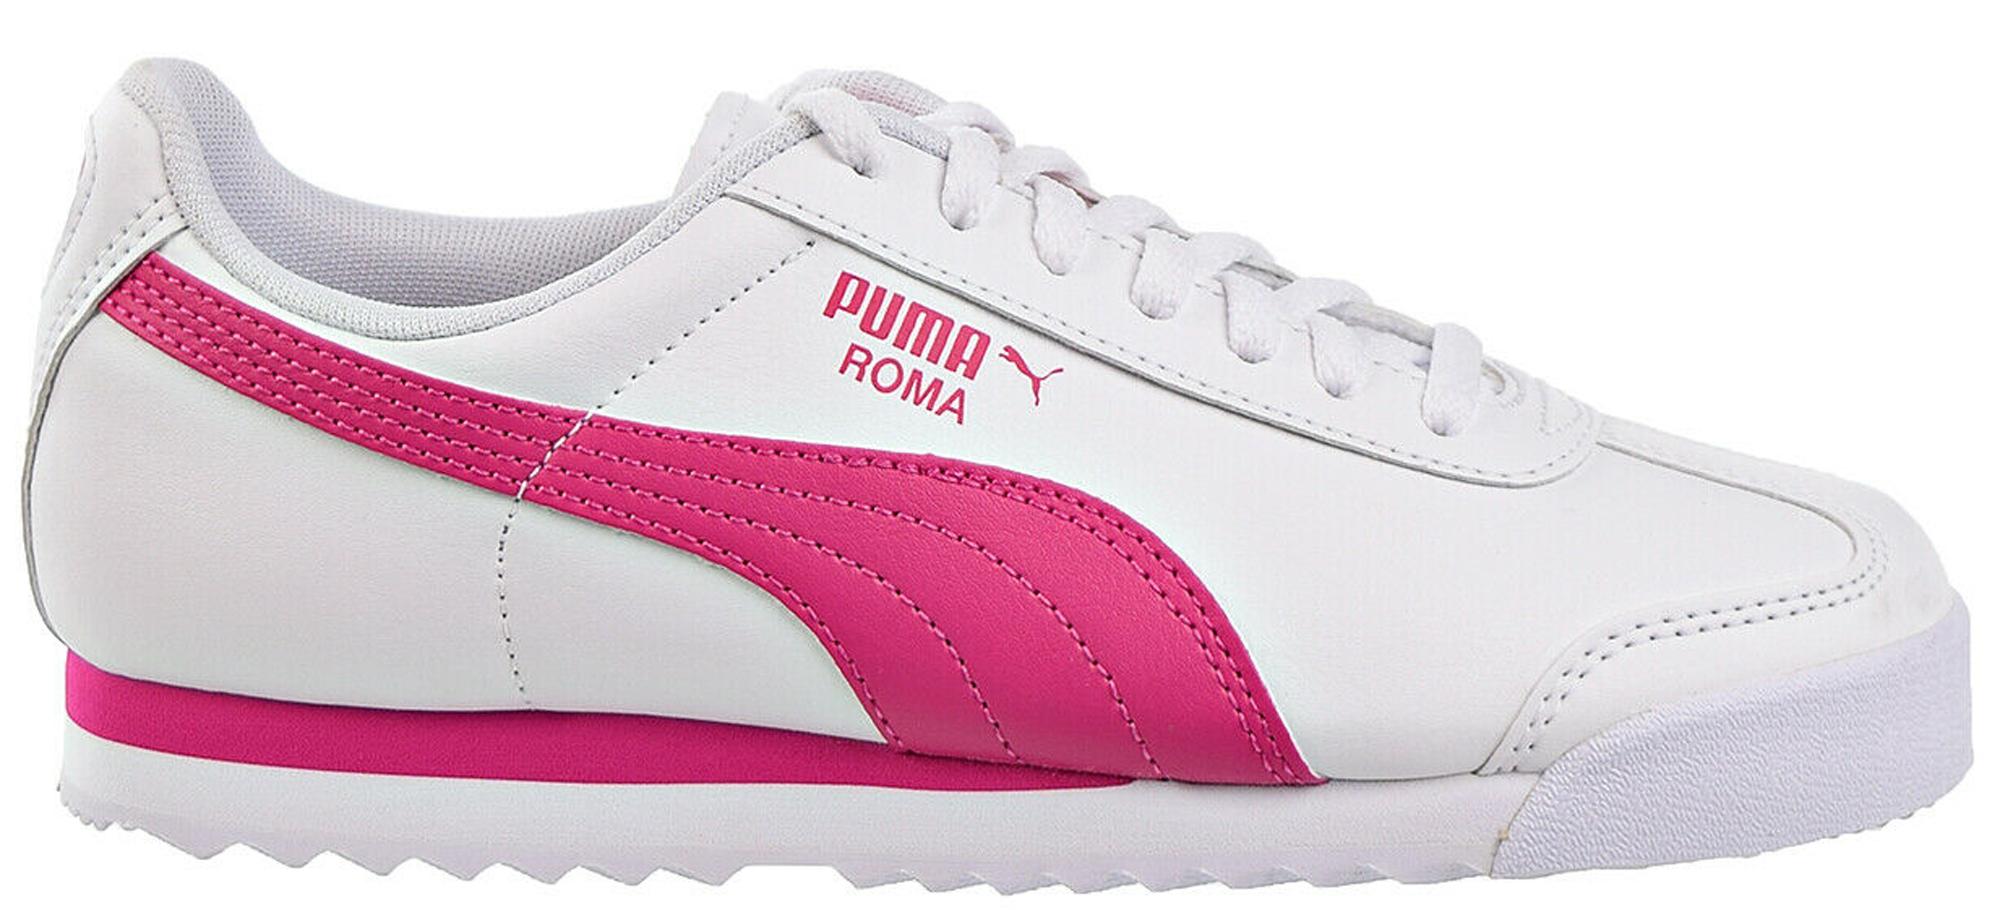 Puma Roma White Fuchsia Purple (GS